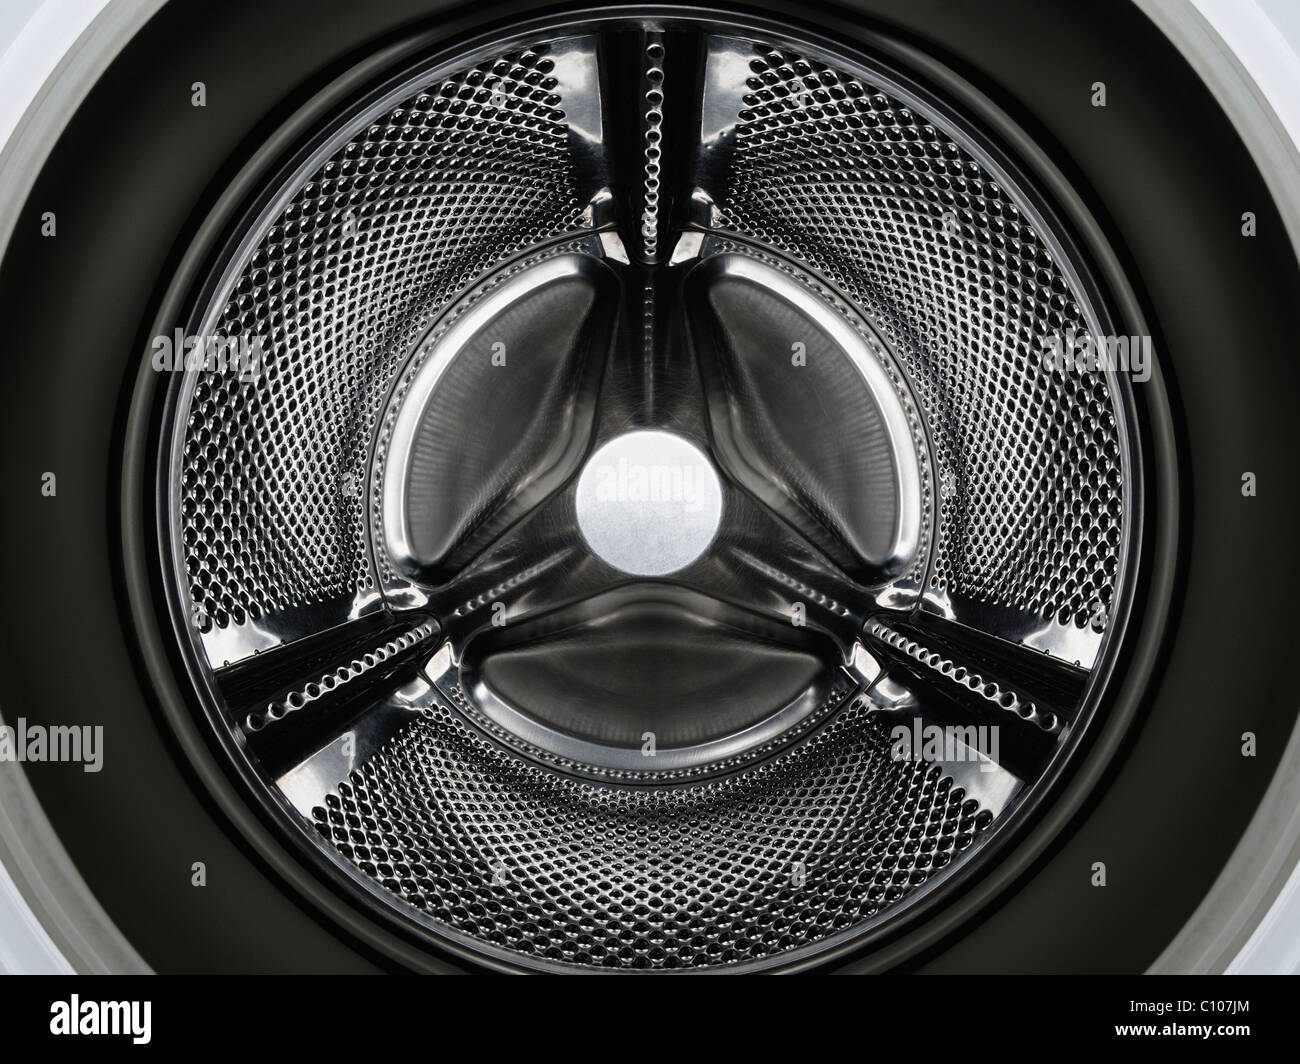 Tambor de lavadora Imagen De Stock